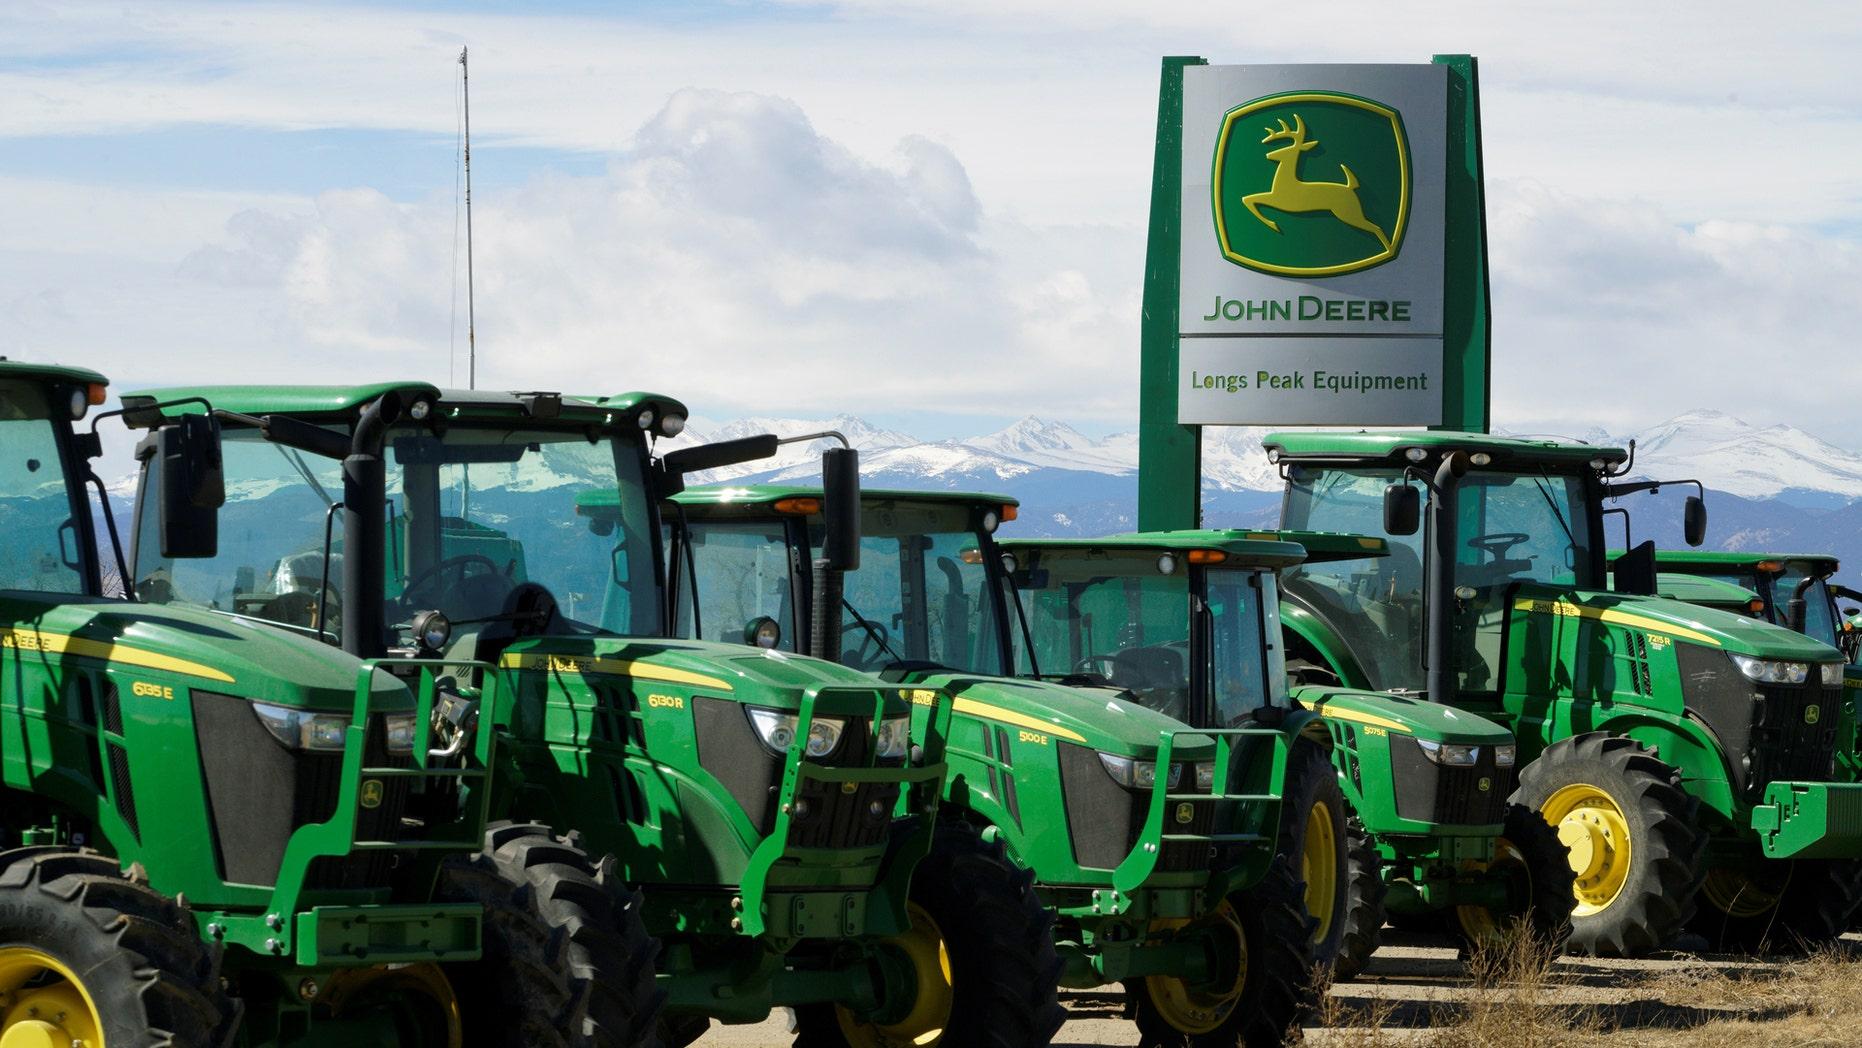 File photo - John Deere tractors are seen for sale at a dealer in Longmont, Colorado, U.S., Feb. 21, 2017. (REUTERS/Rick Wilking)